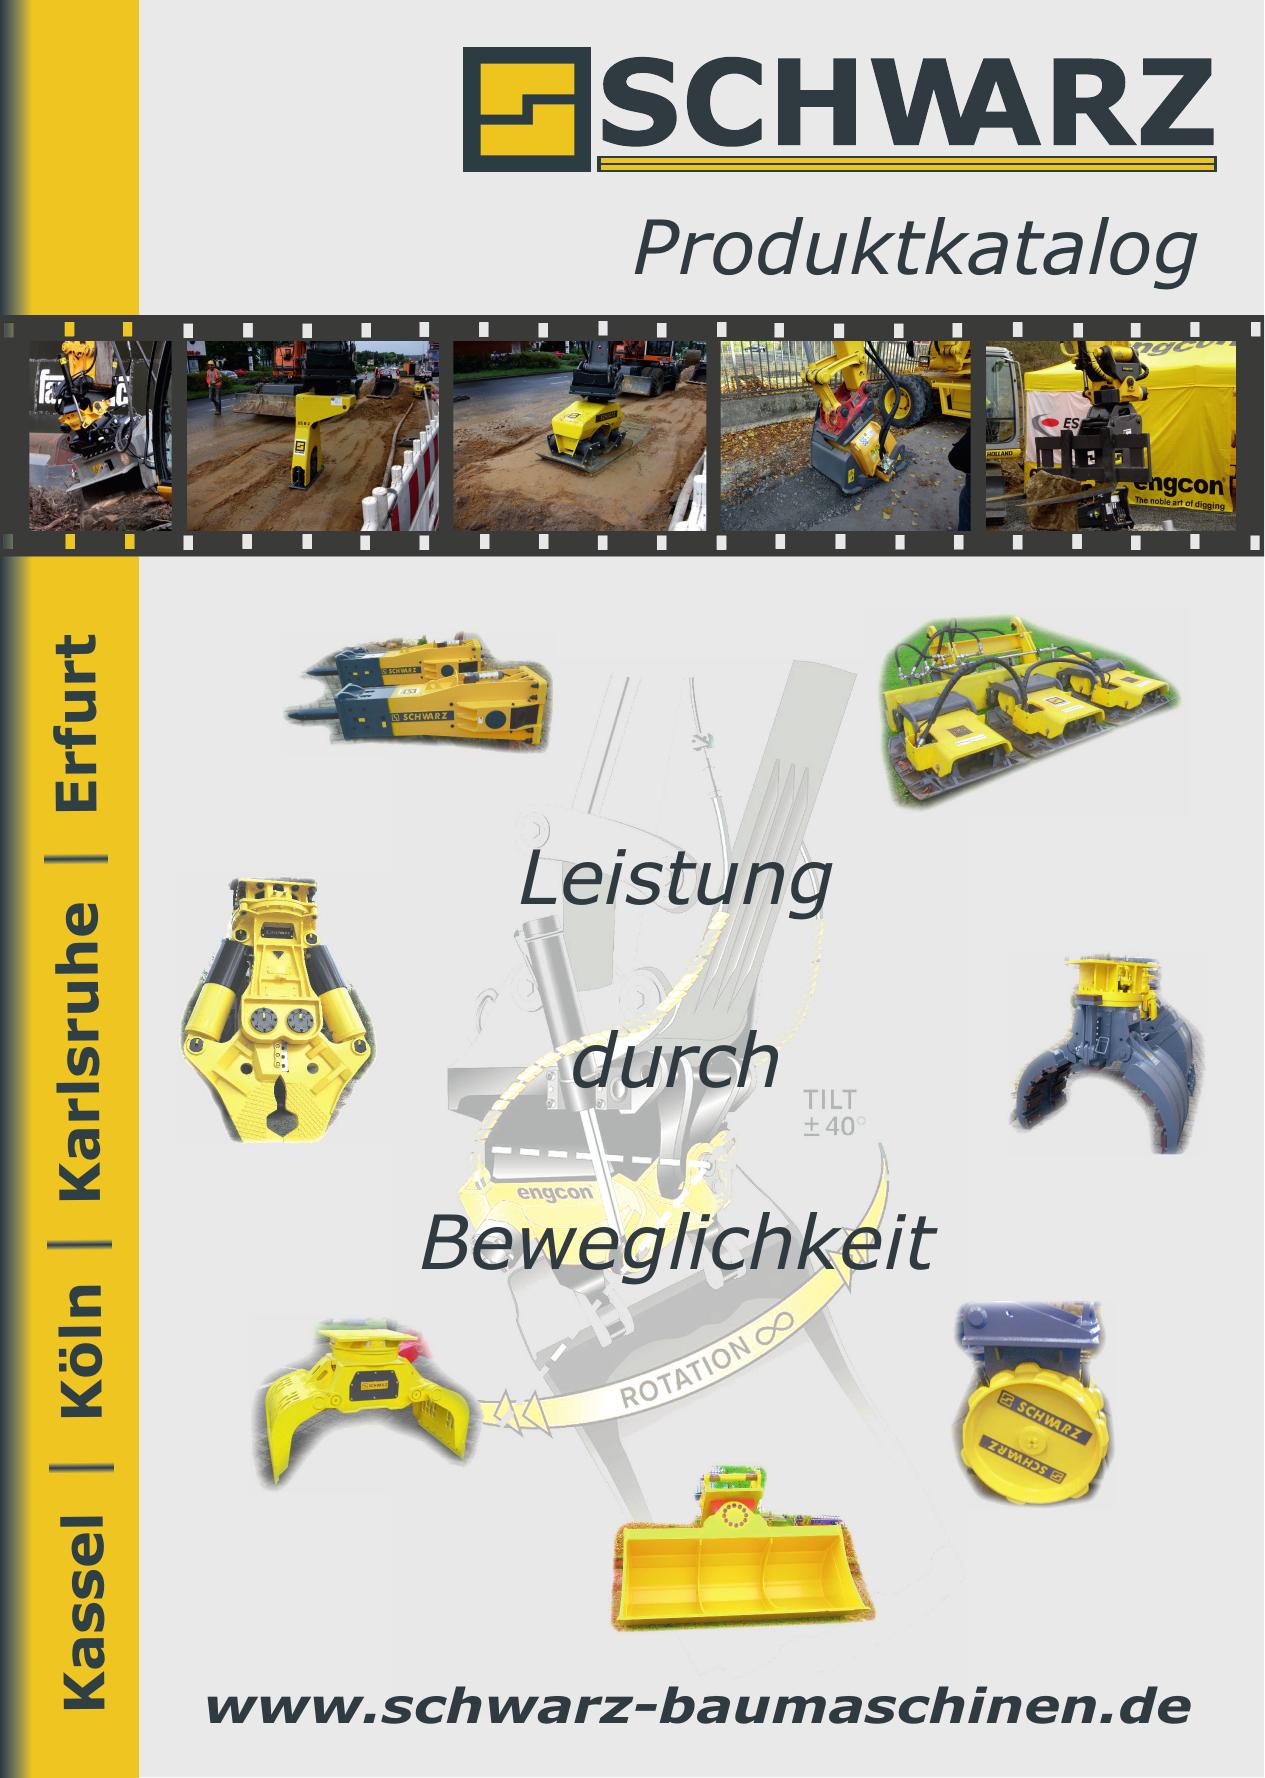 Kraftvoll Grabenräumlöffel Cw05 1300 Mm Löffel Schaufel Bagger Cw 05 130 Cm 3-4 T Baumaschinenteile & Zubehör